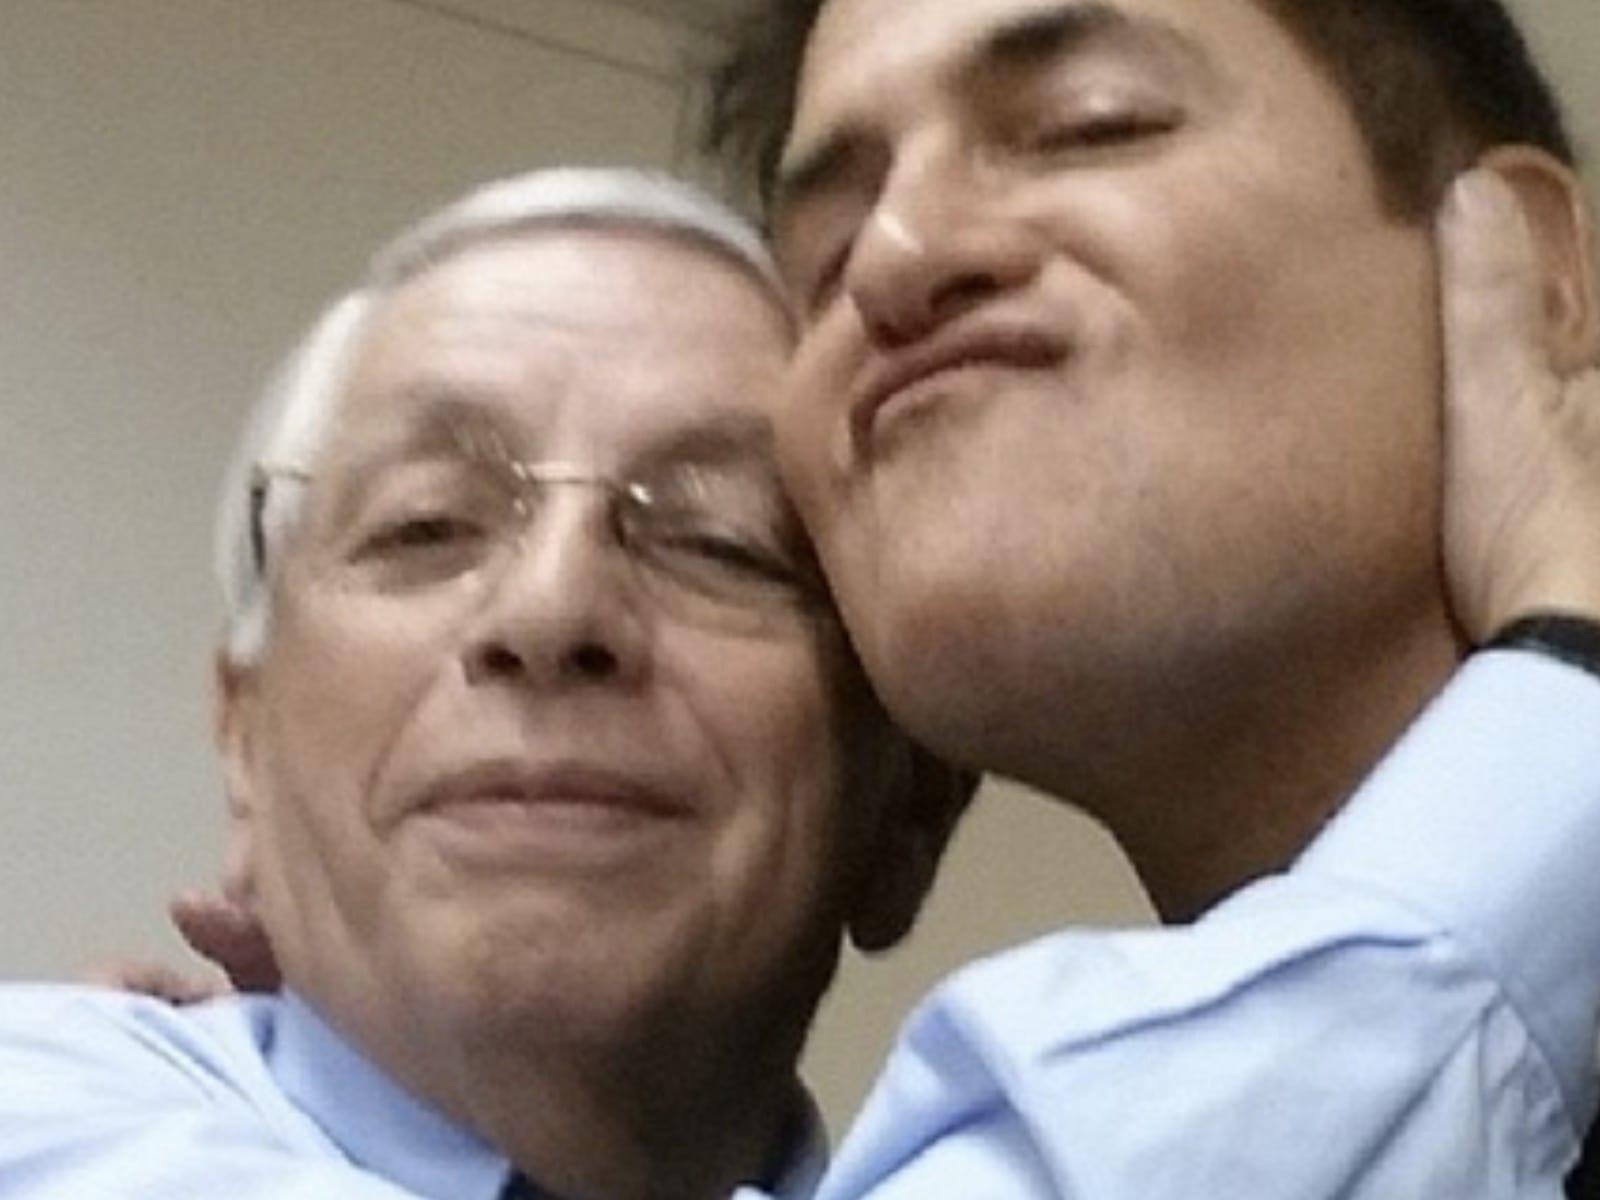 David Stern Mark Cuban Selfie